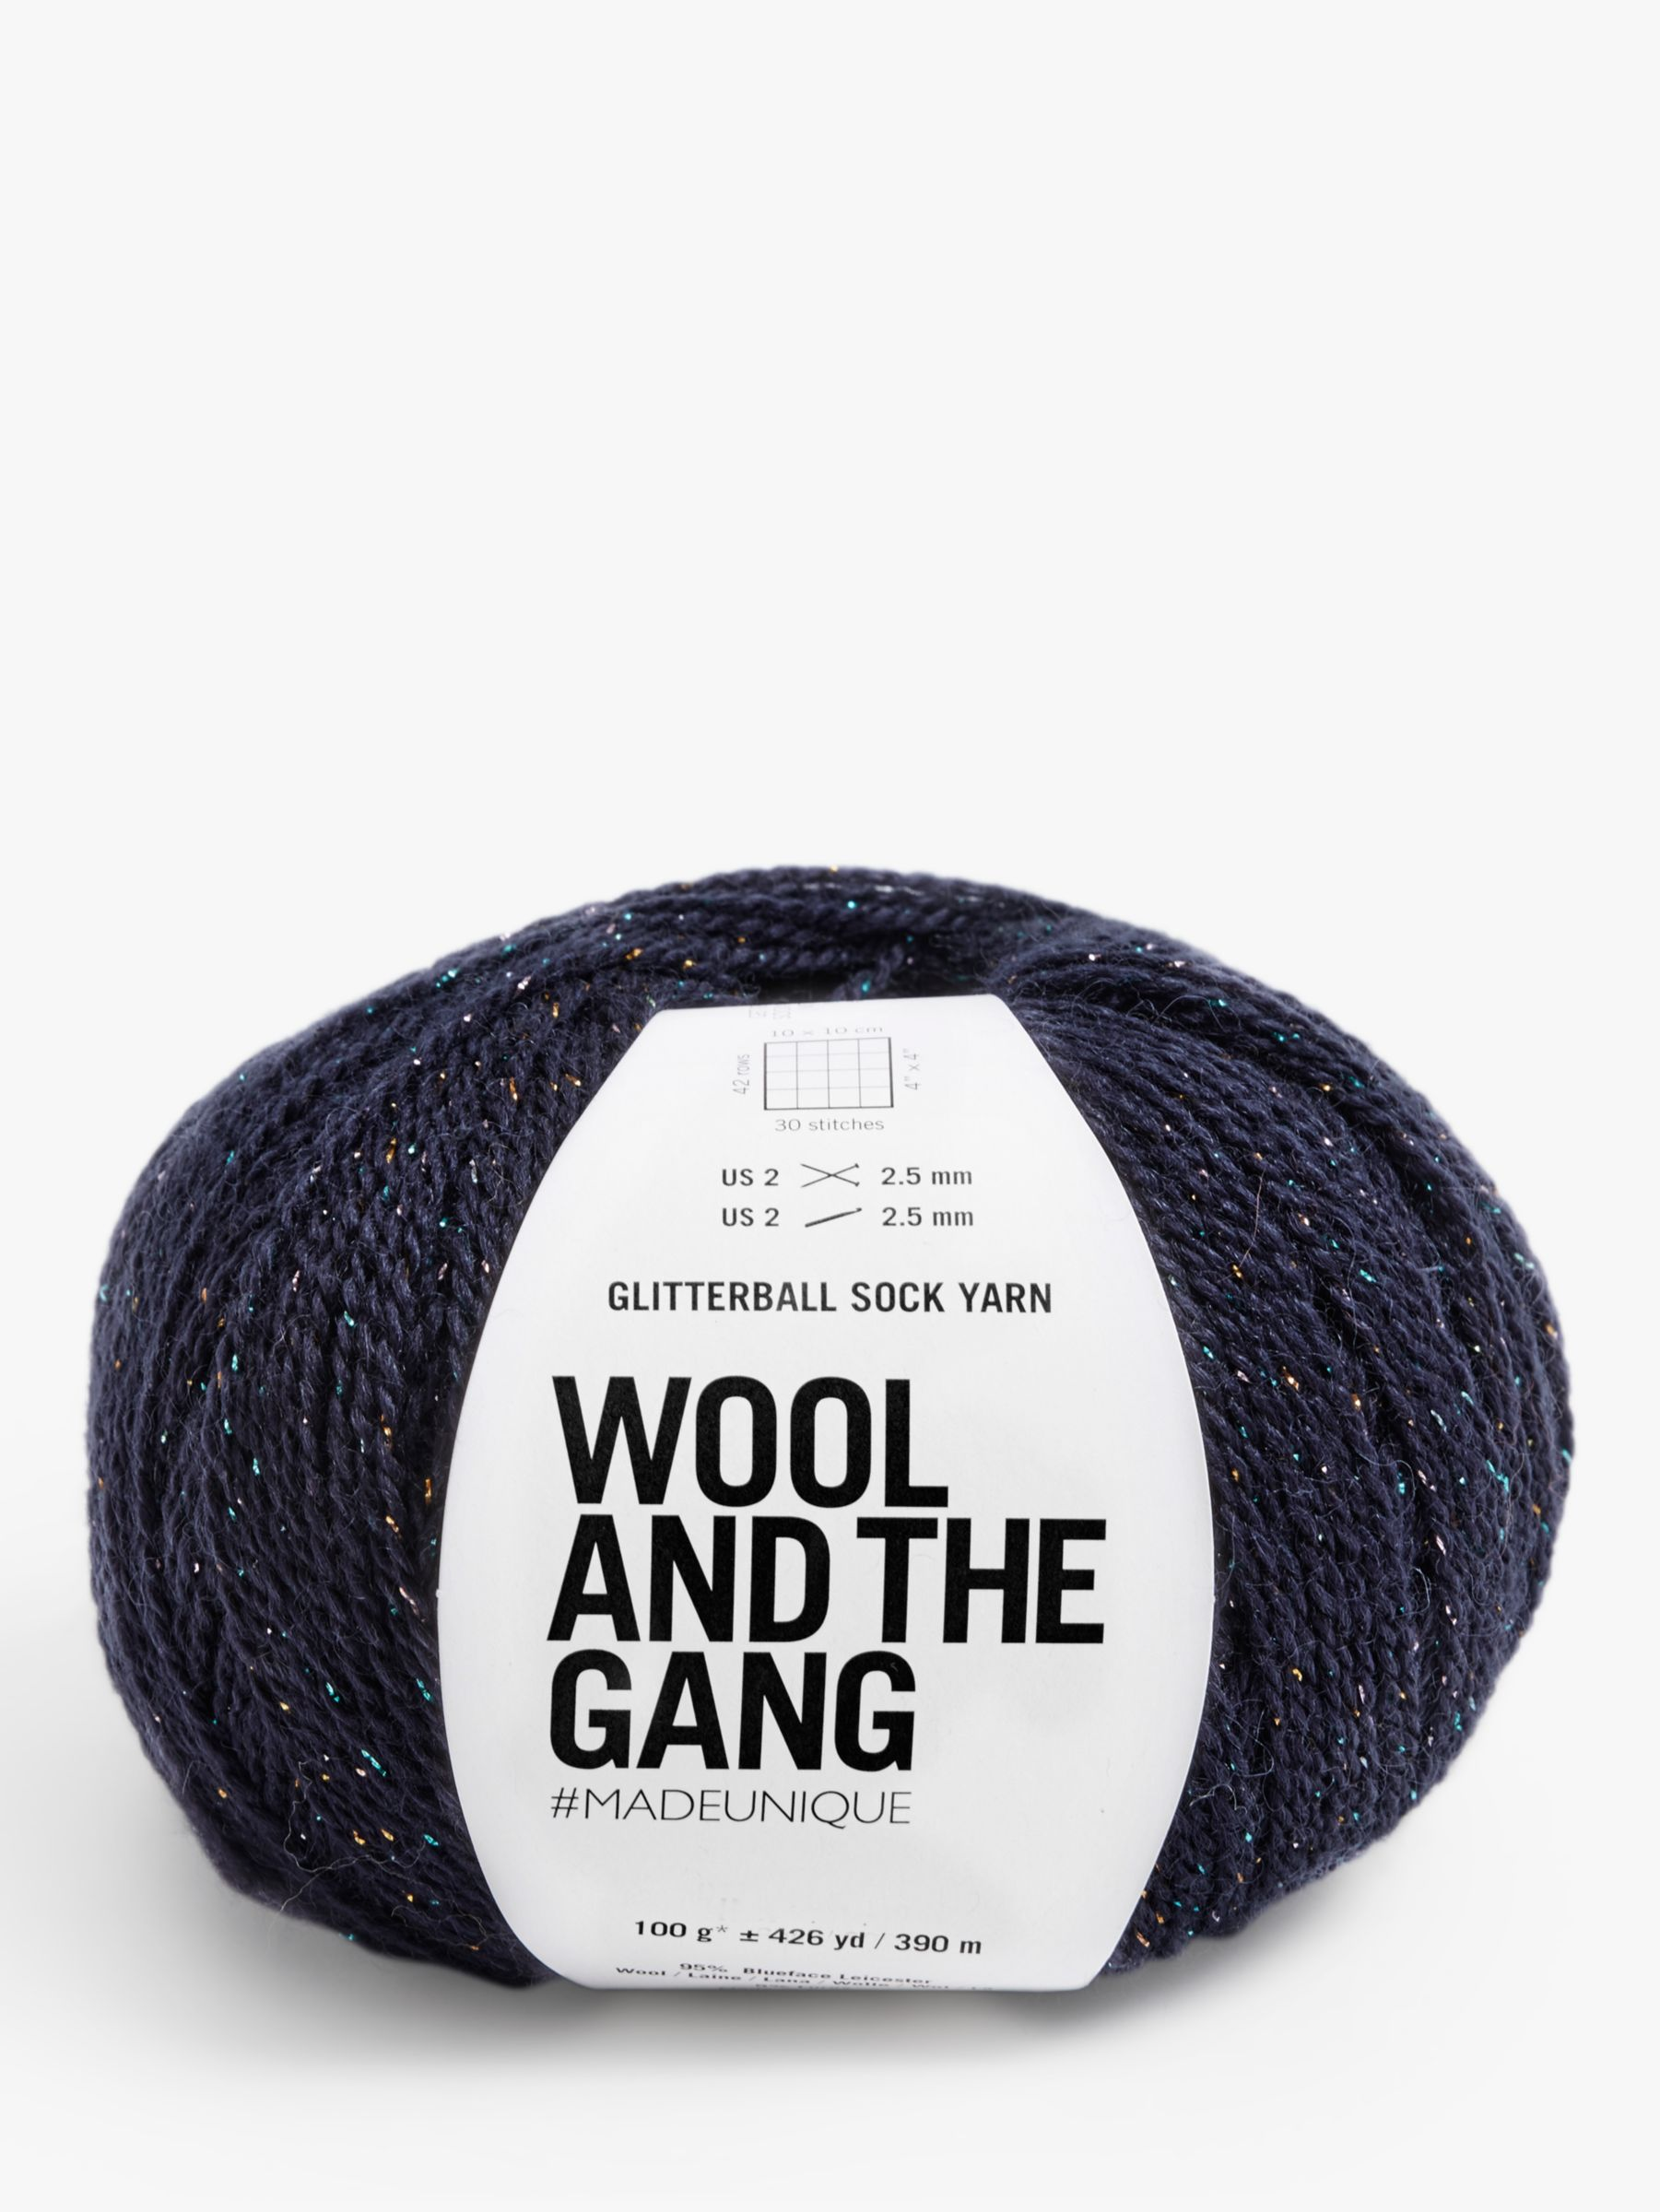 Wool and the Gang Wool And The Gang Glitterball Sock Yarn, 100g